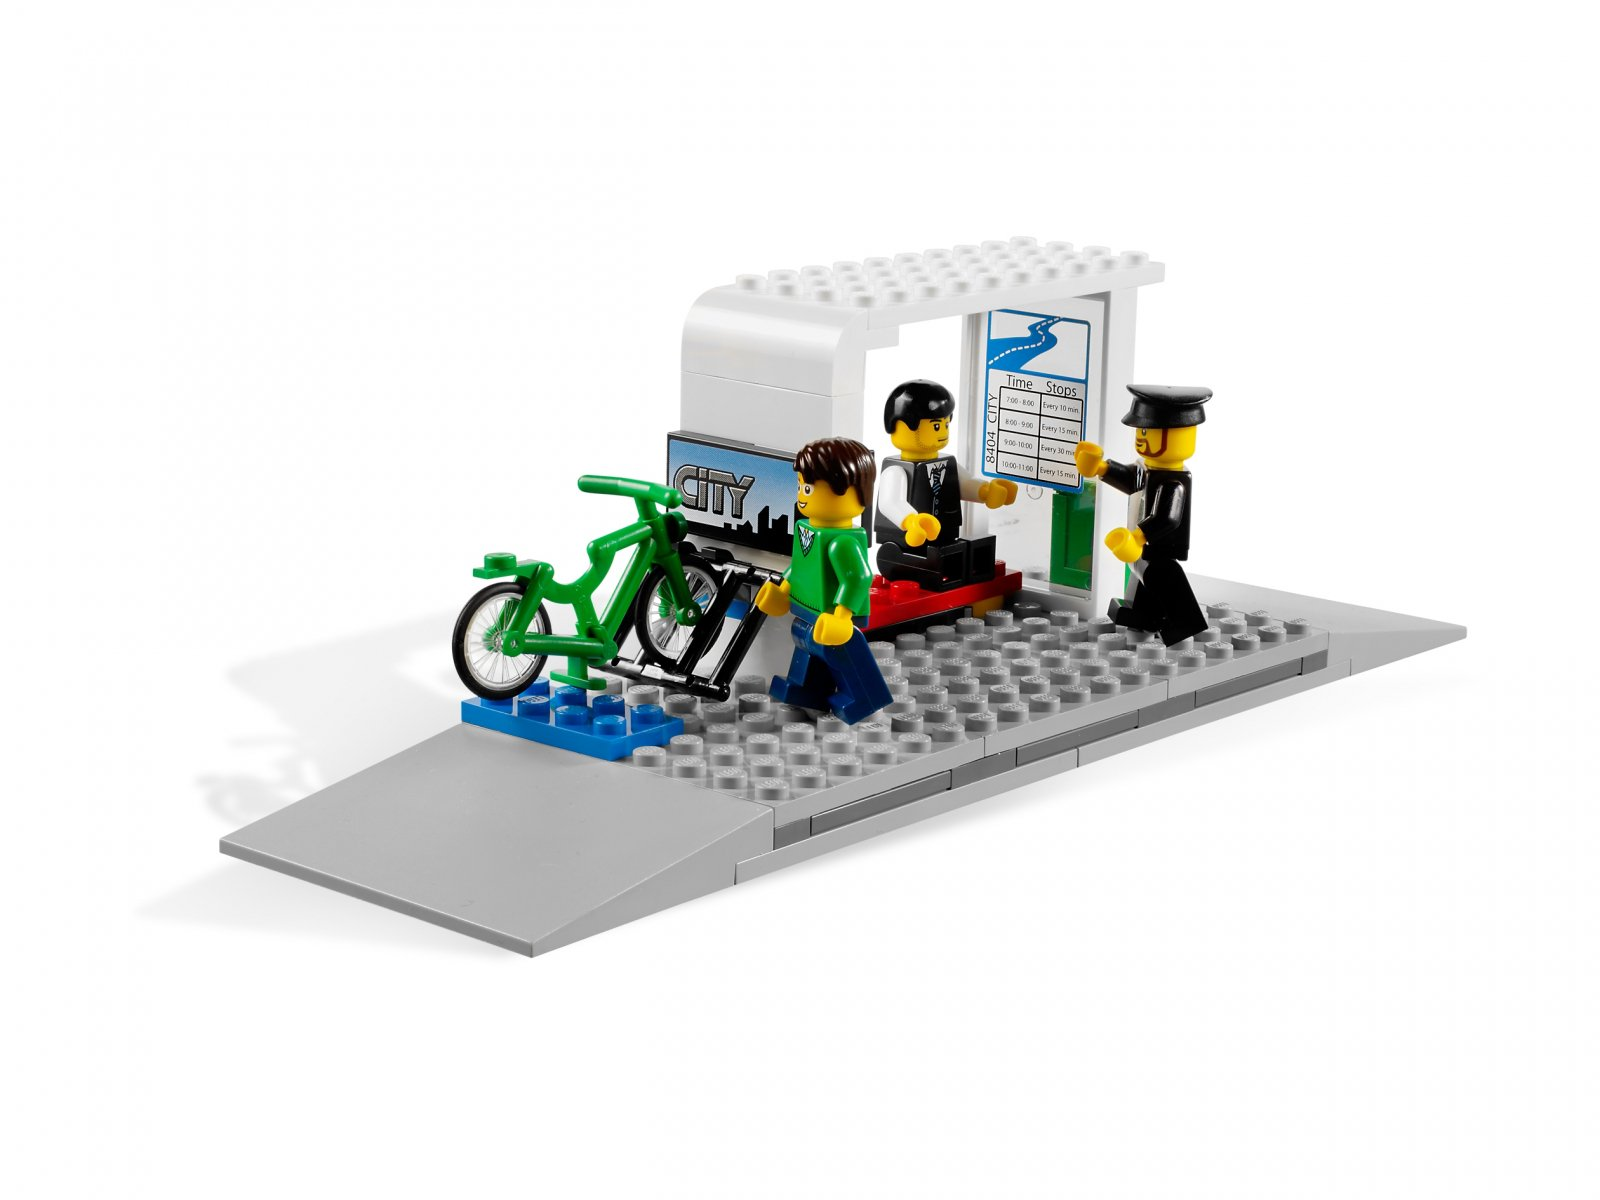 LEGO 8404 City Public Transport